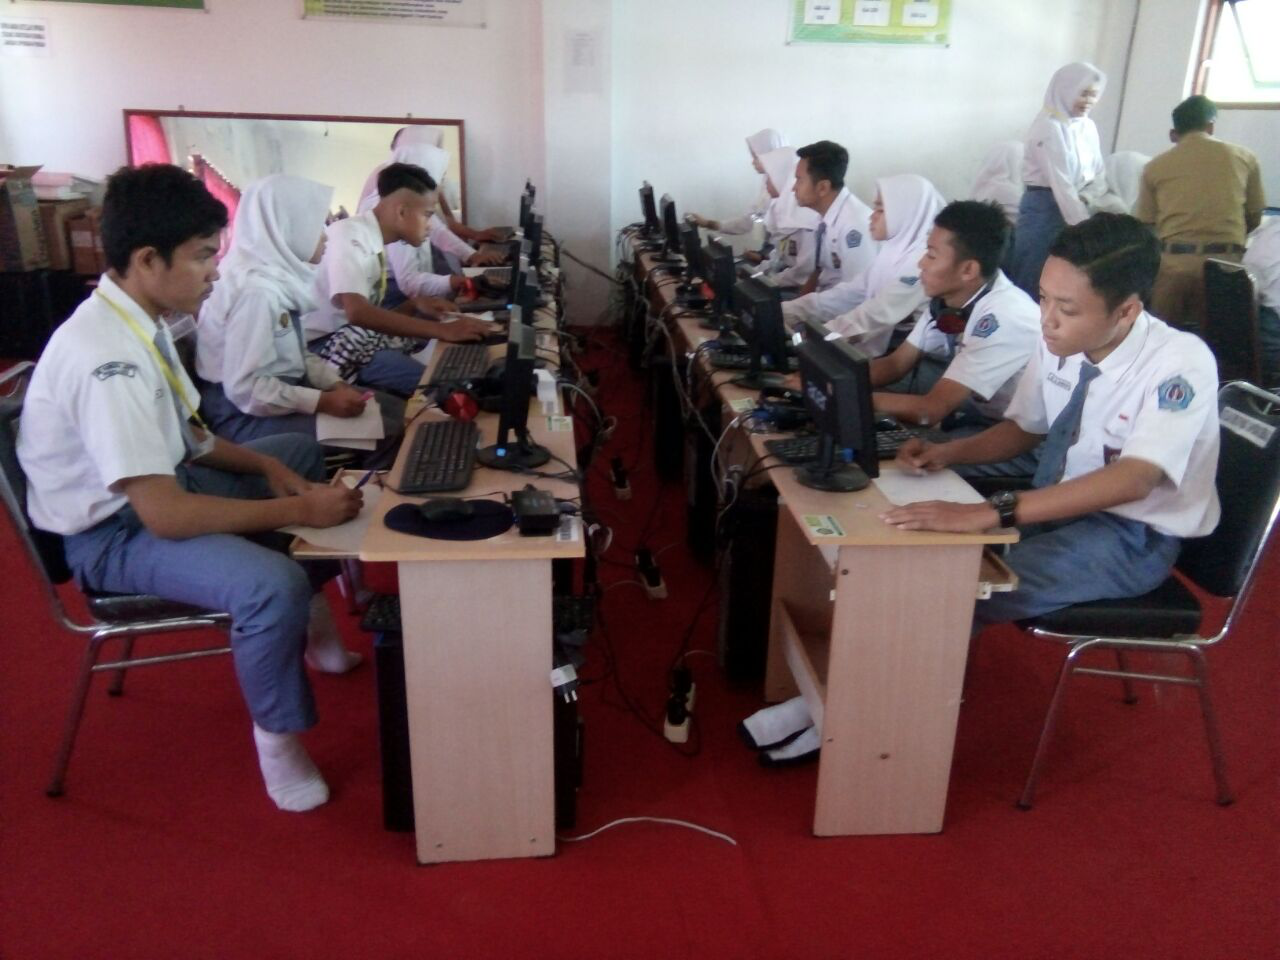 LibertyTourismHighSchoolInIndonesia-sharedcomputingsolution03.png